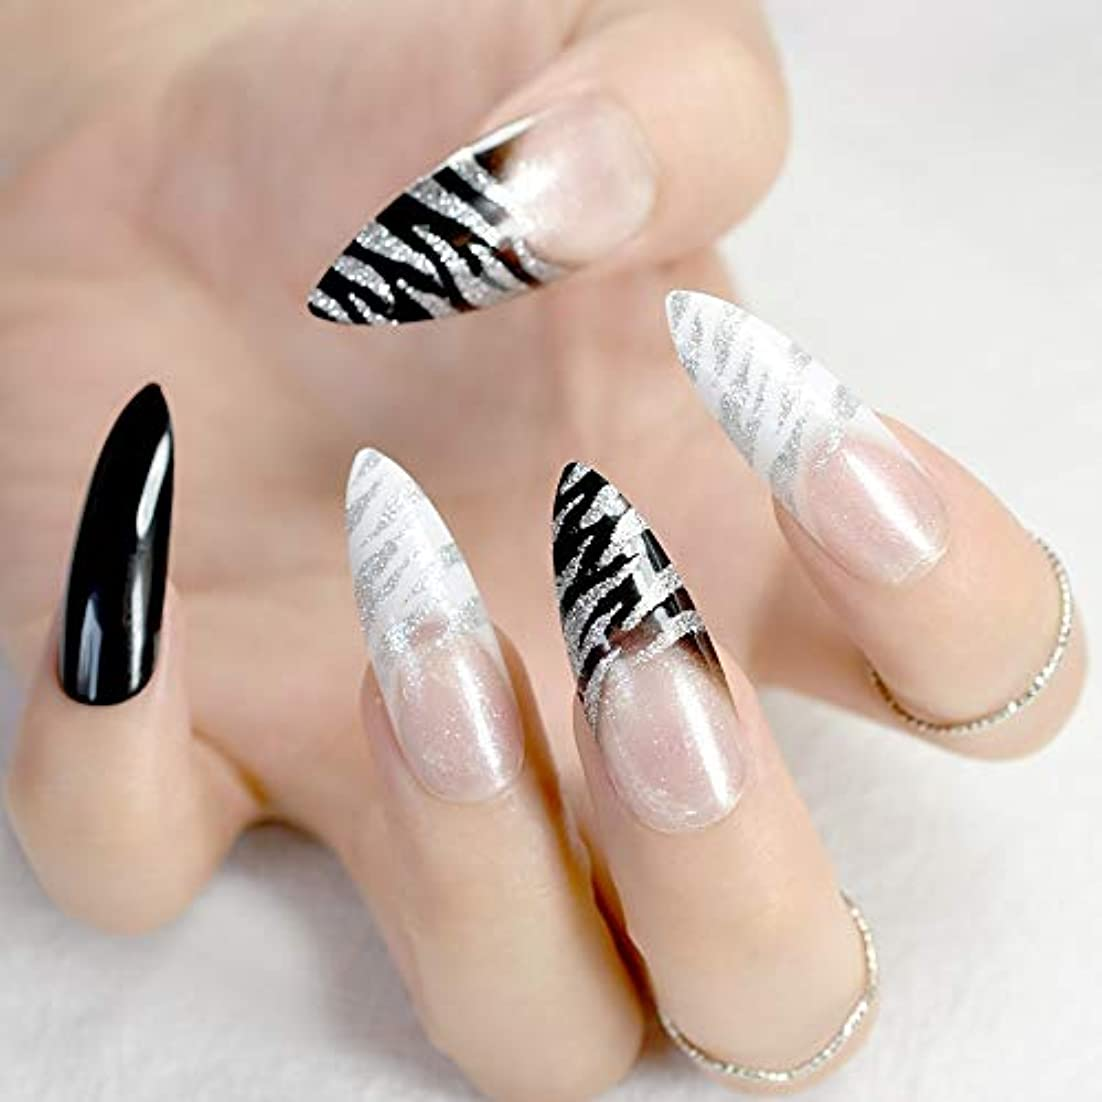 XUTXZKA 24ピースファッションアクリル尖った偽爪スティレット爪クリアキラキラフレンチネイルマニキュアのヒントフルカバー製品